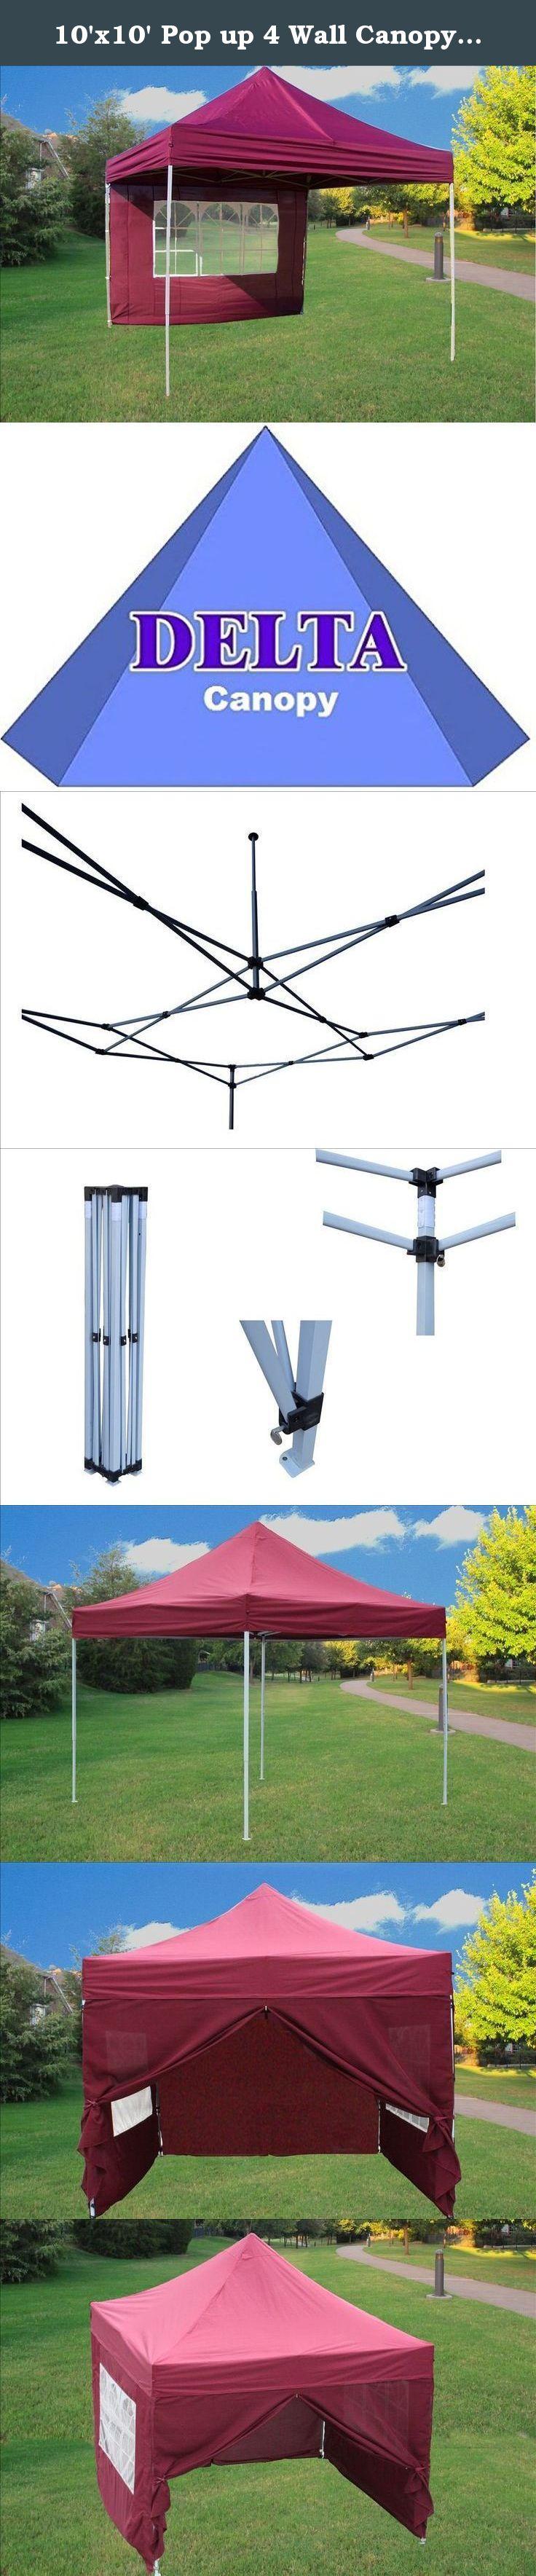 Best 10 X10 Pop Up 4 Wall Canopy Party Tent Gazebo Ez Maroon 400 x 300